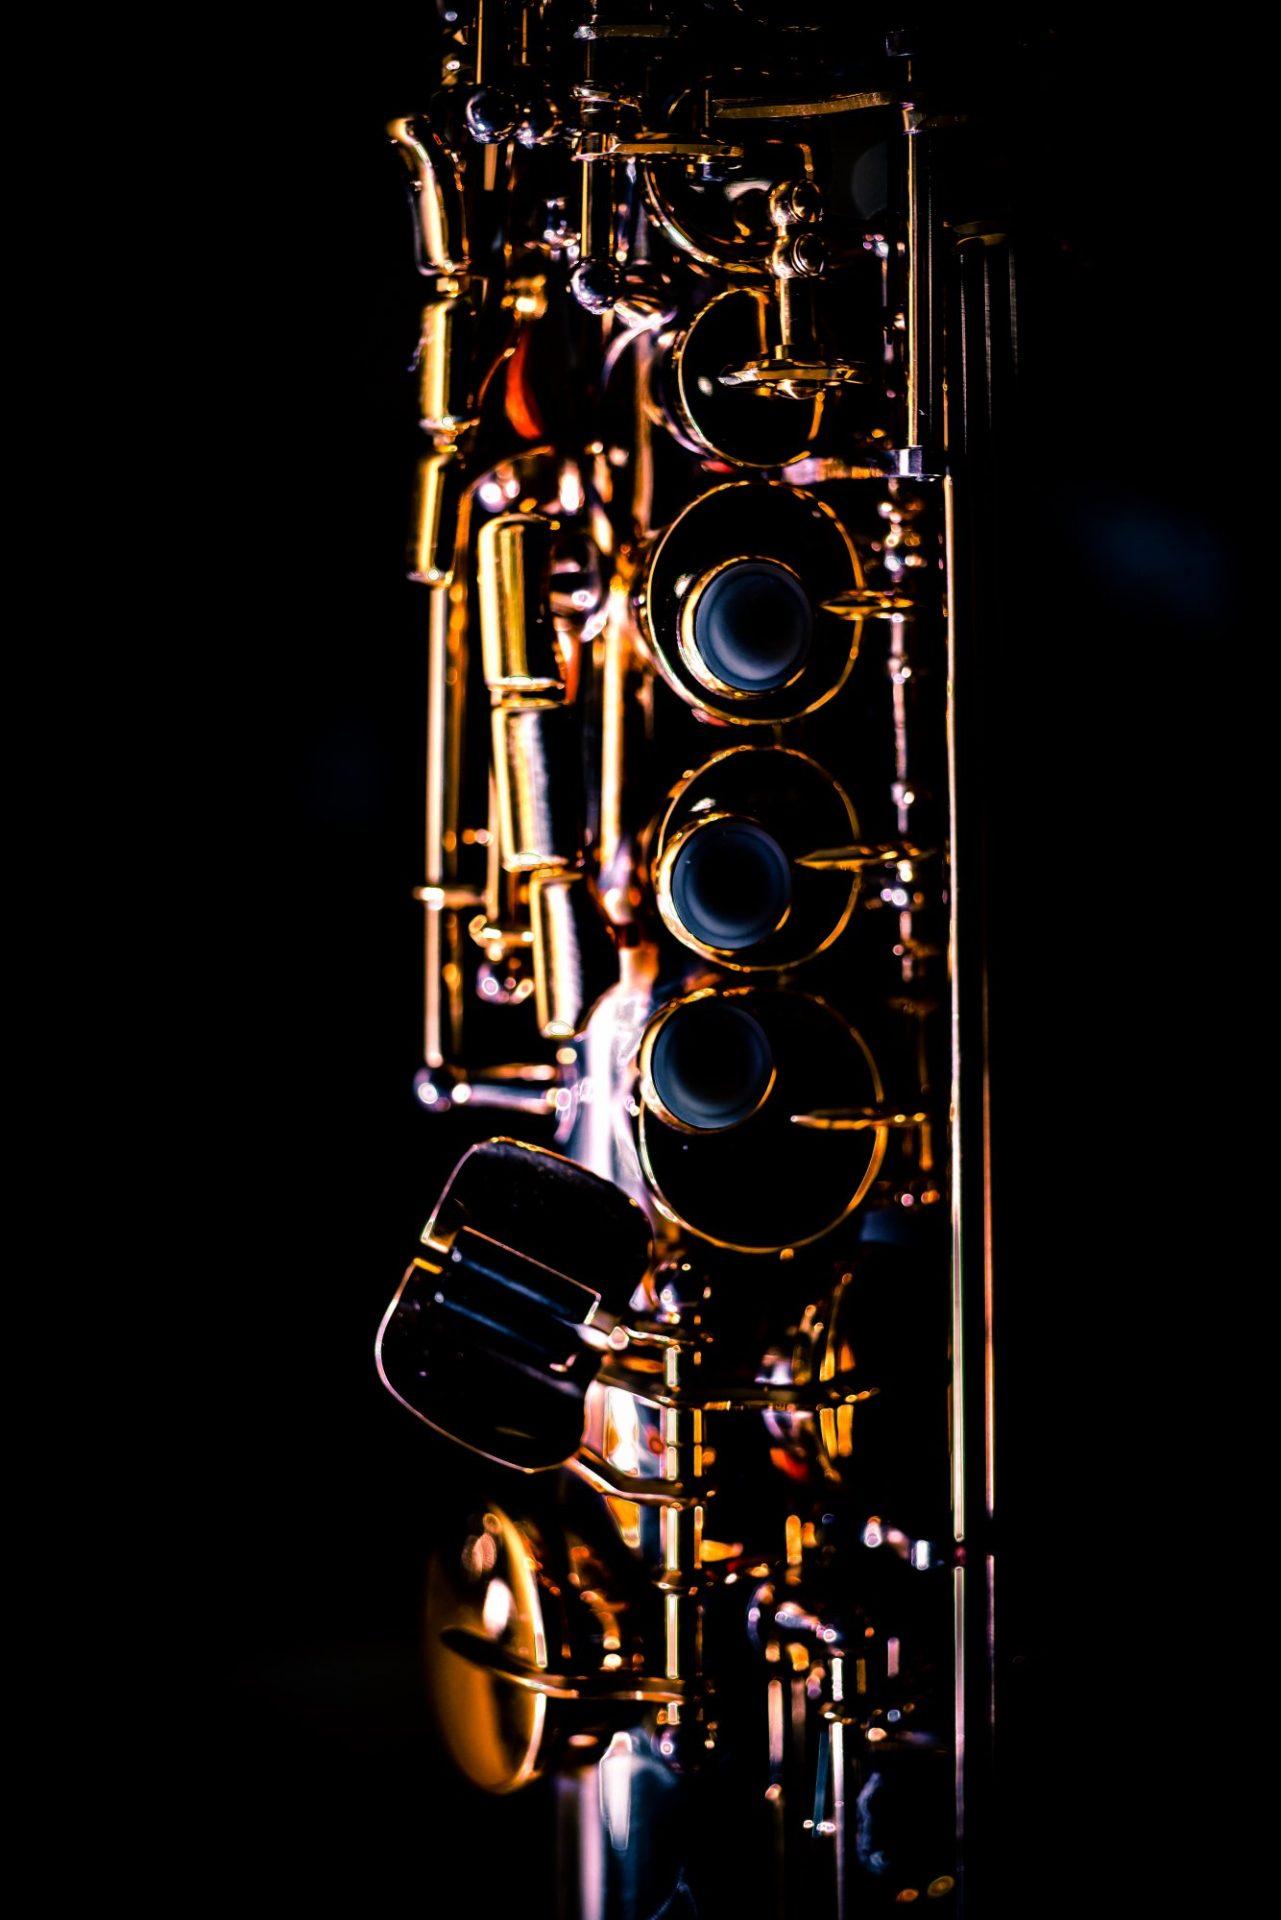 Jazz - Fotograf: Julian Staudt